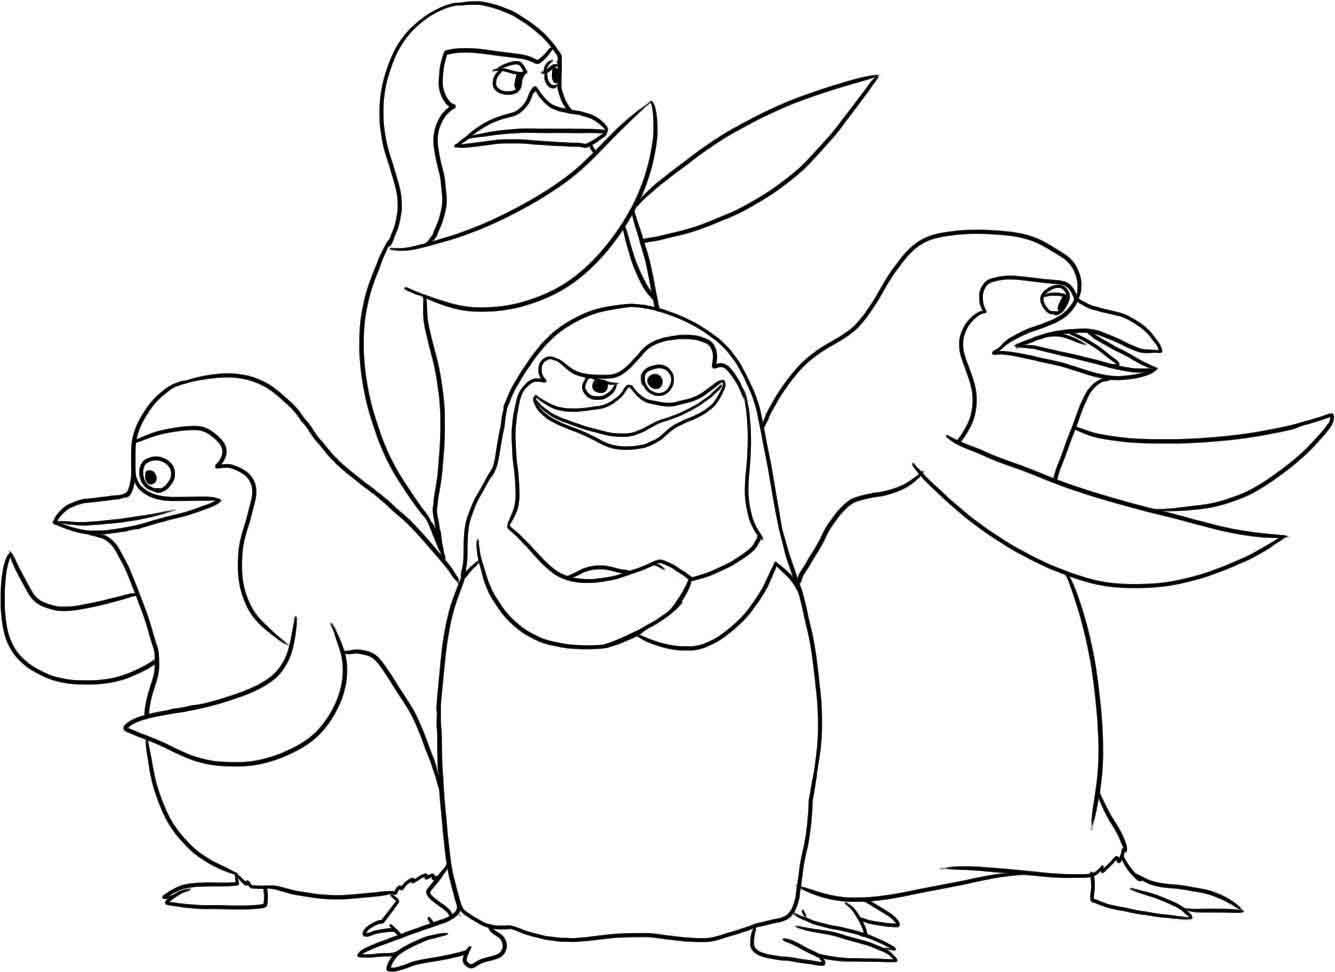 Рисунок пингвины мадагаскара